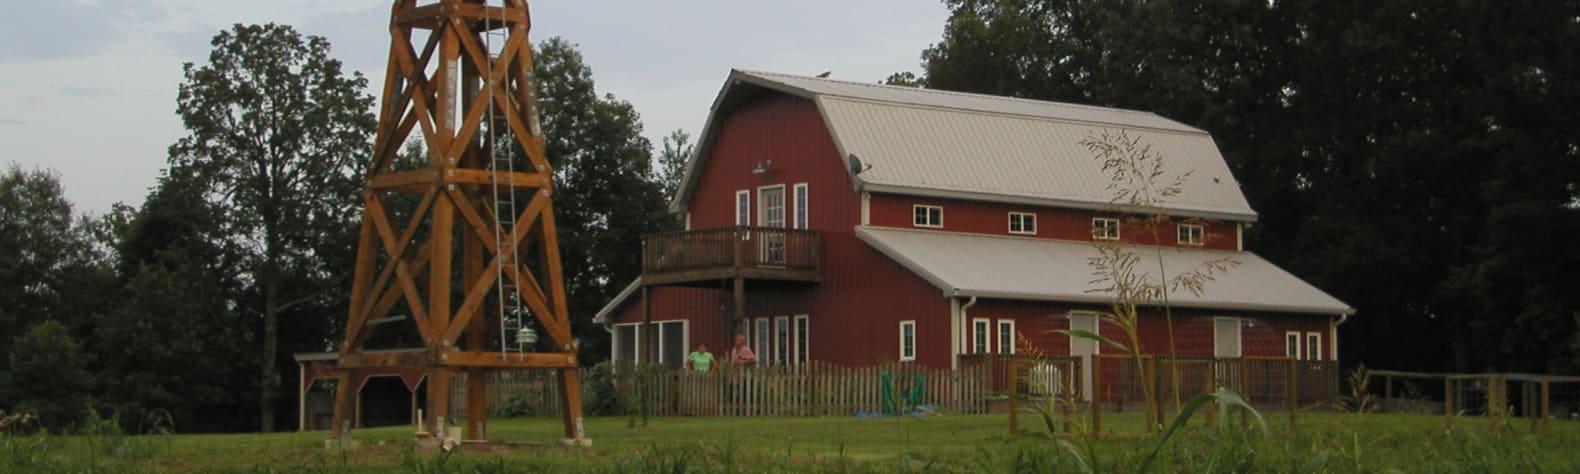 Little Texas Farm and Lodge